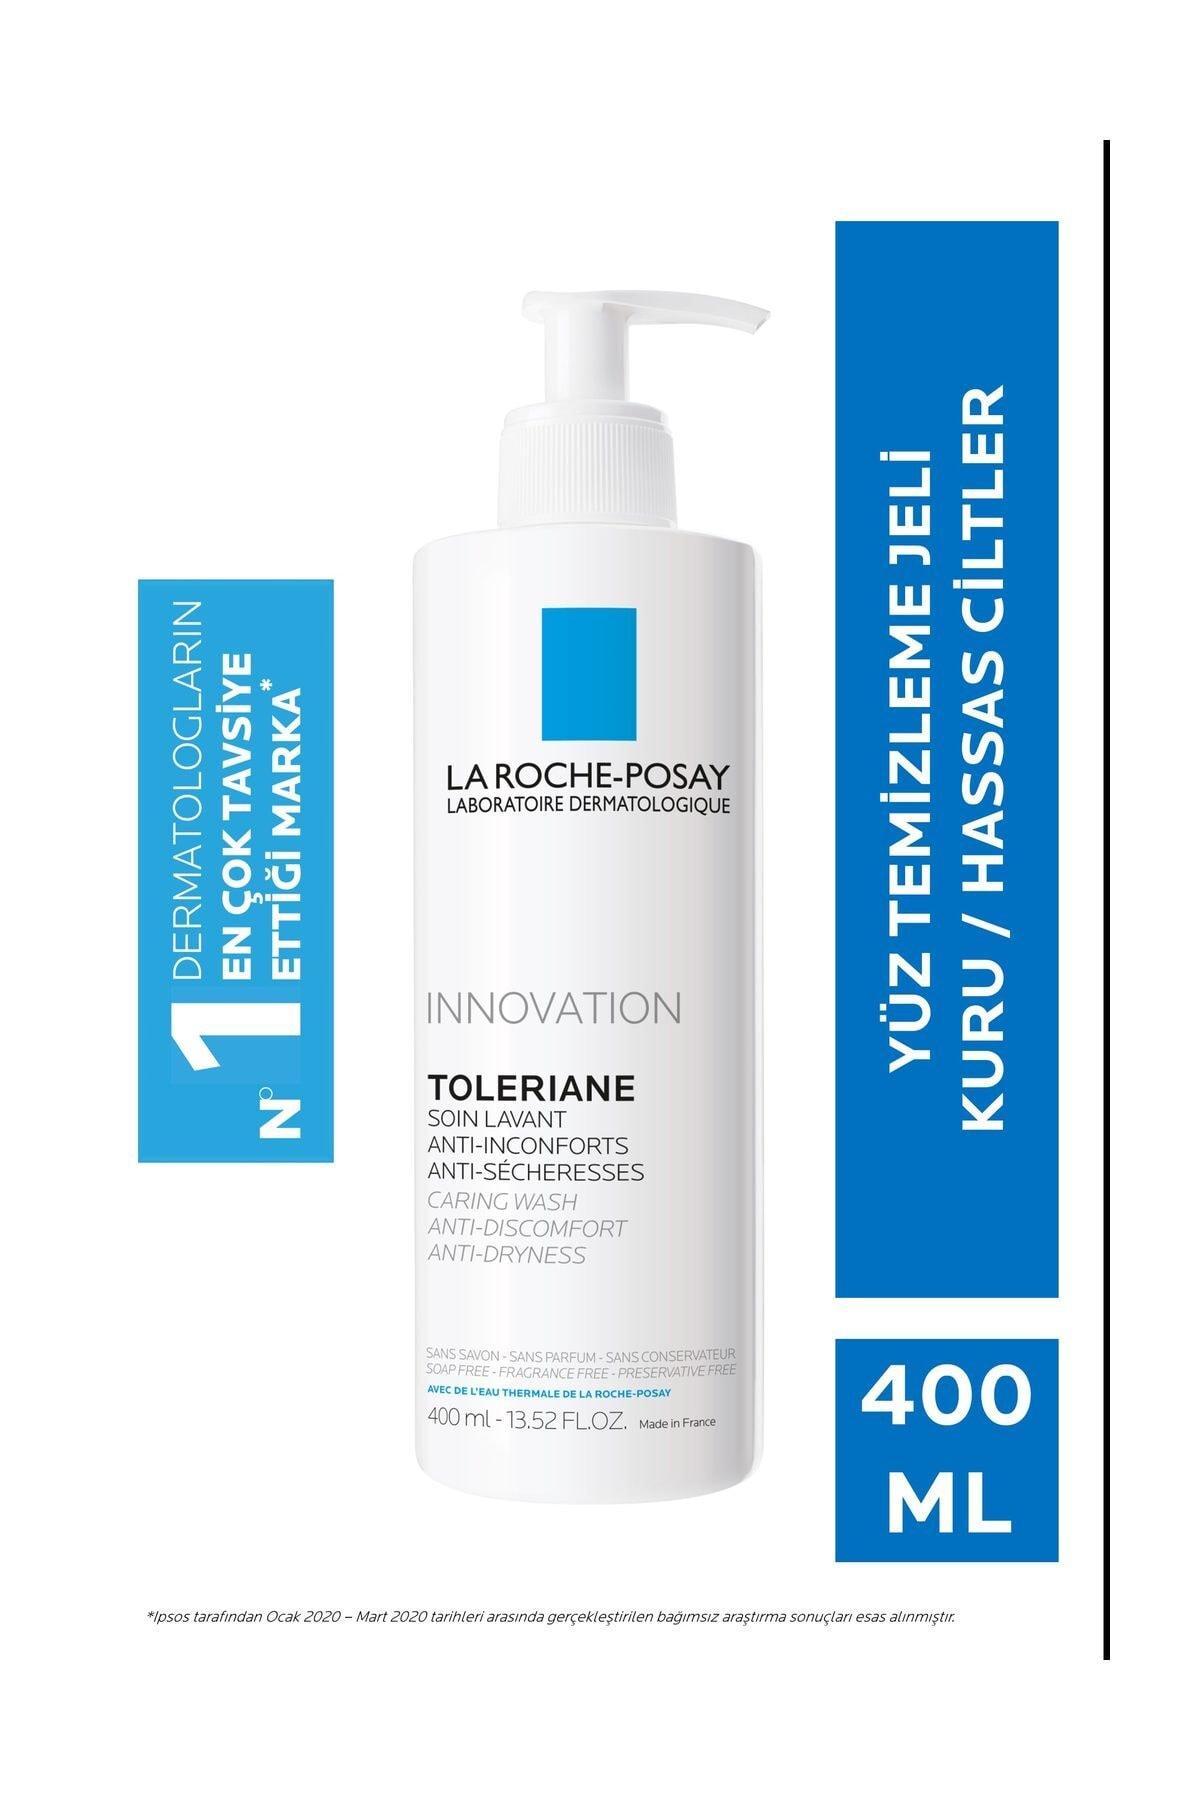 La Roche Posay Toleriane Caring Krem Temizleyici Kuru/Hassas Ciltler 400 ml 3337875545778 1